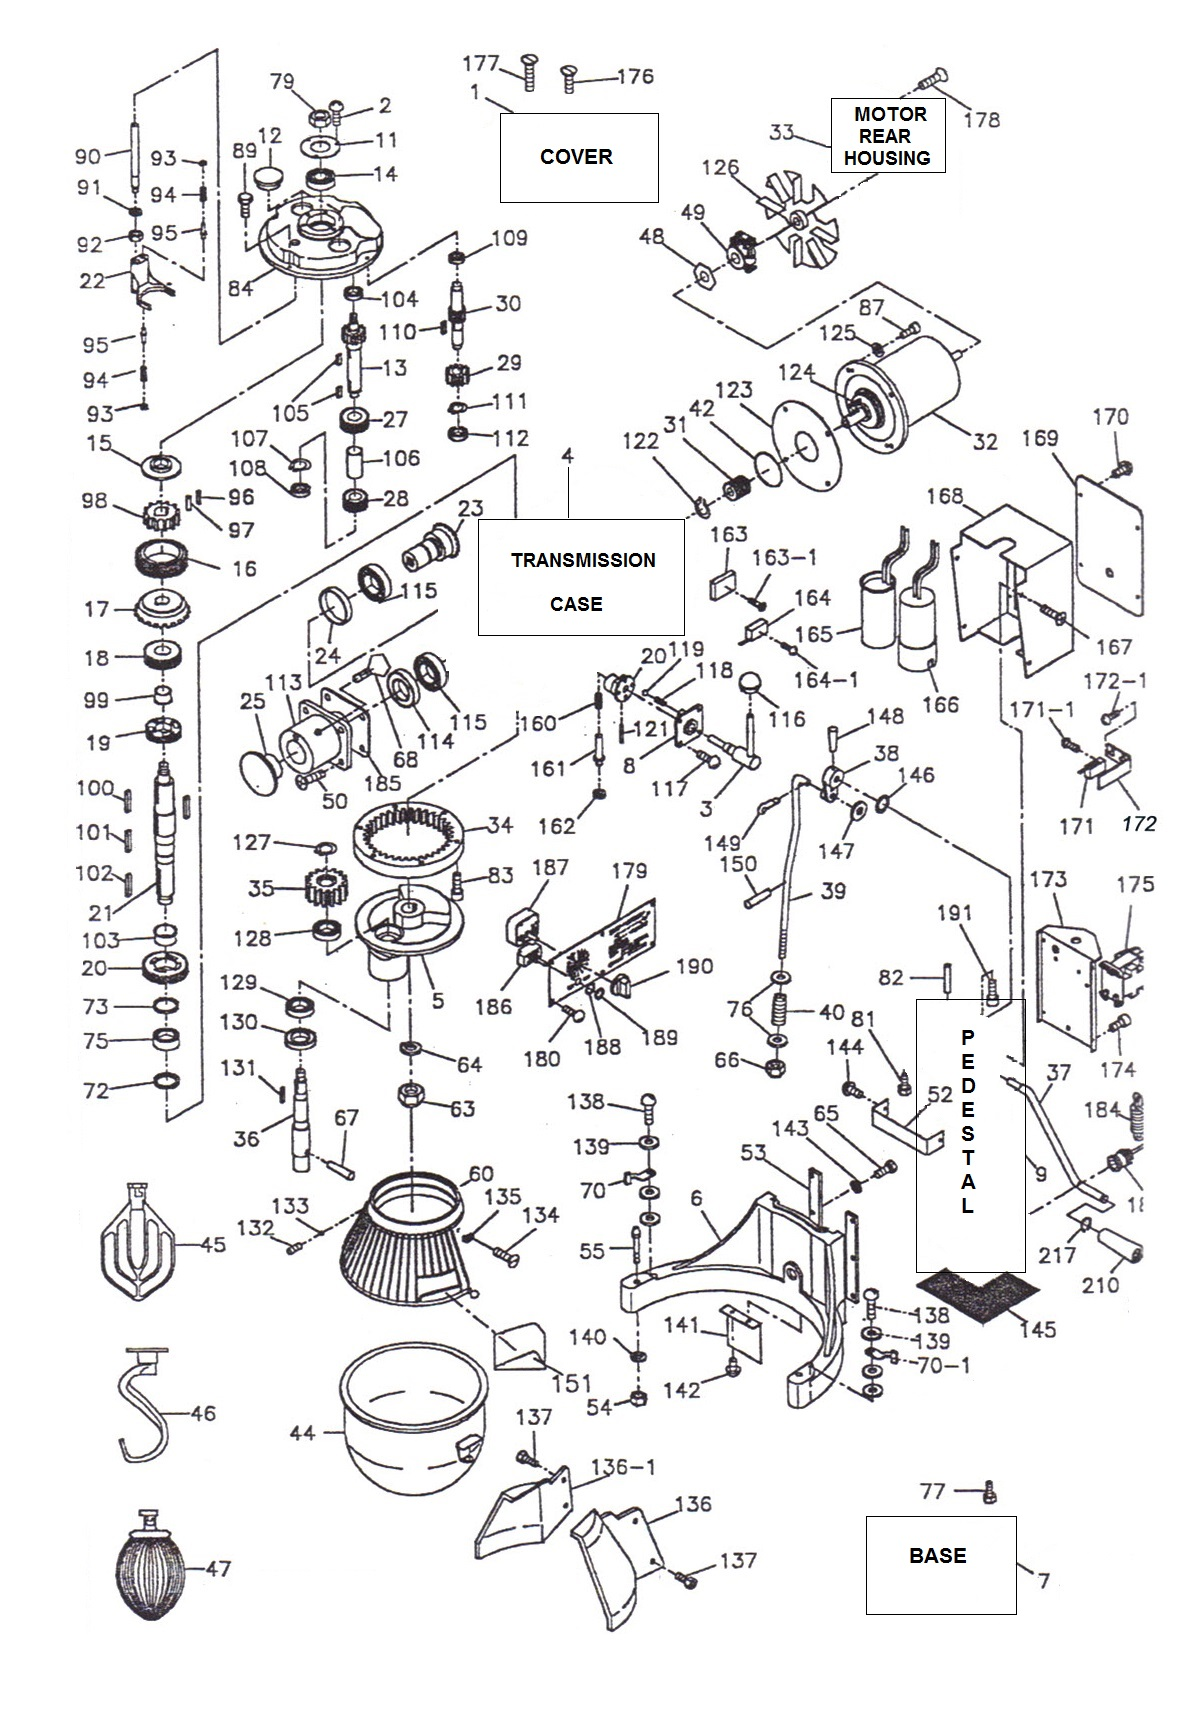 Thunderbird ARM-02 Parts Diagram | Parts TownParts Town